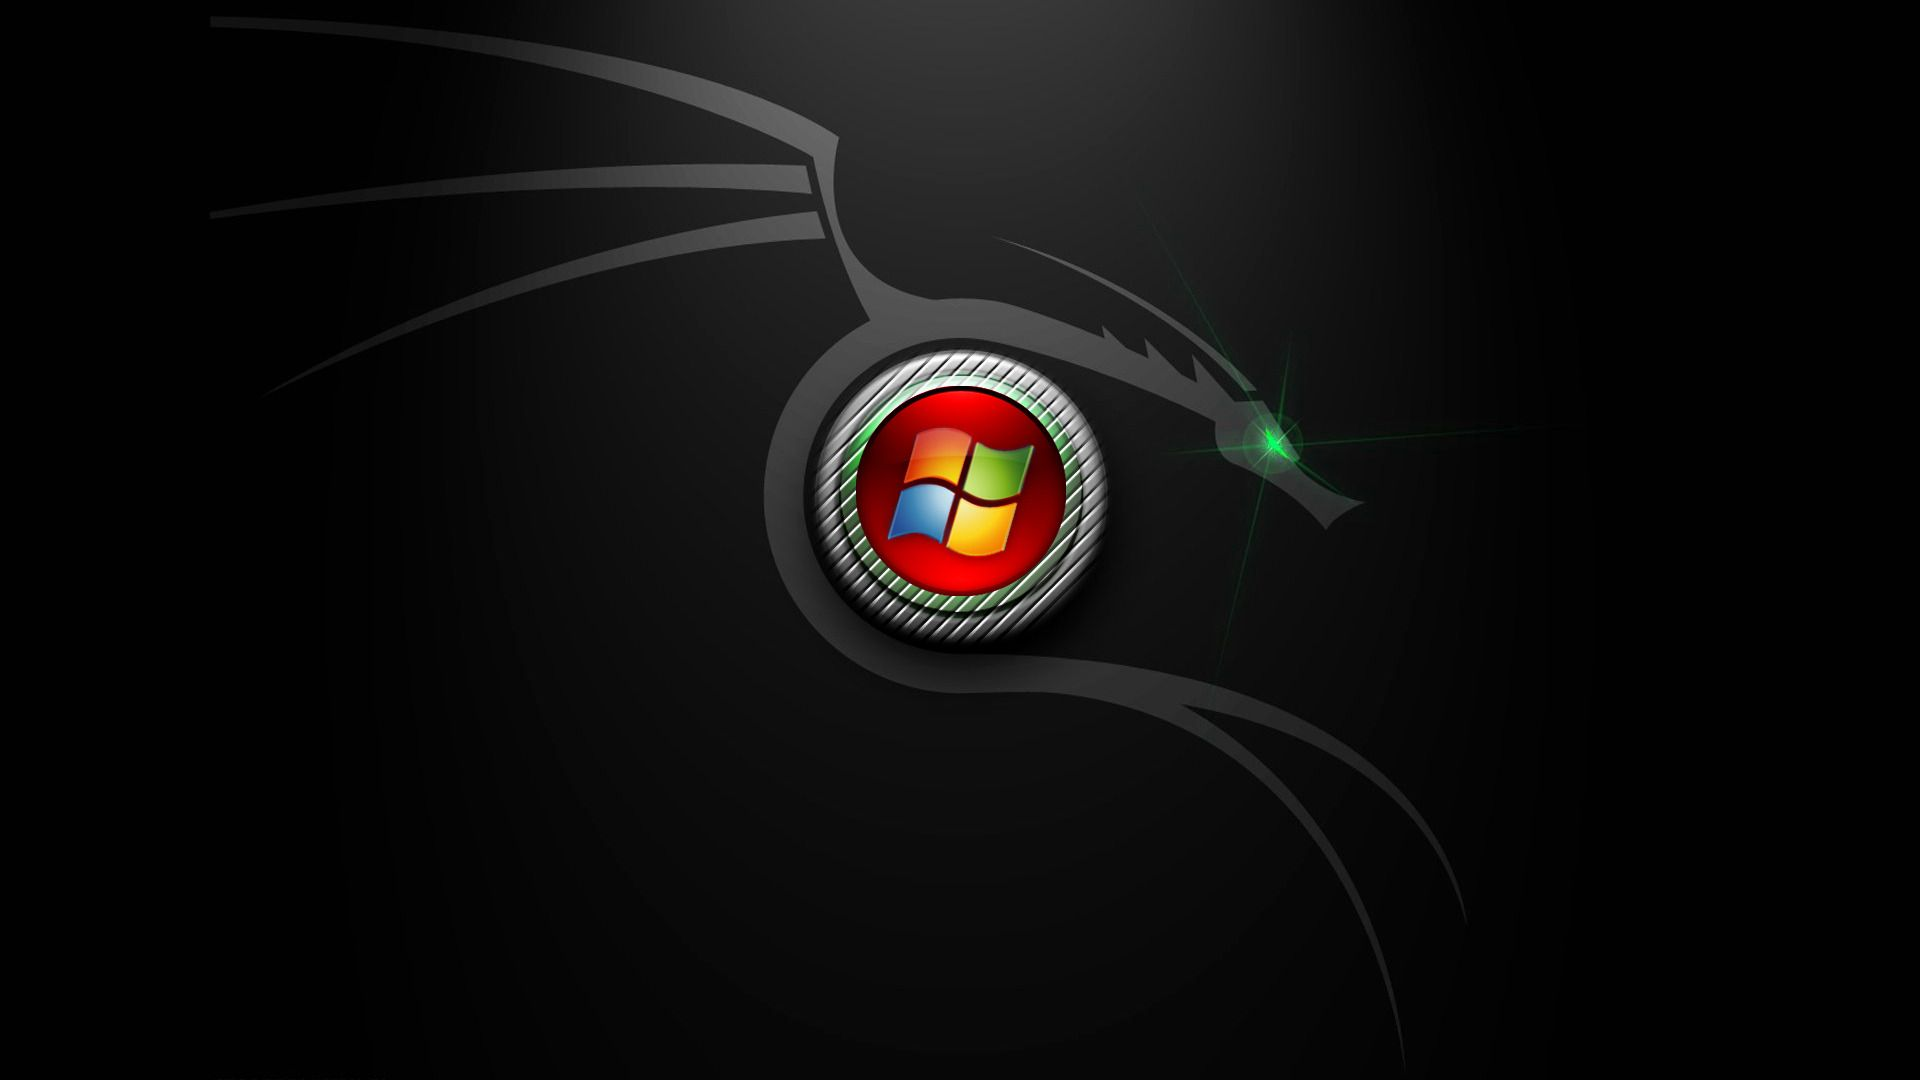 Windows 7 Dragon Wallpaper Windows Pinterest Windows Web